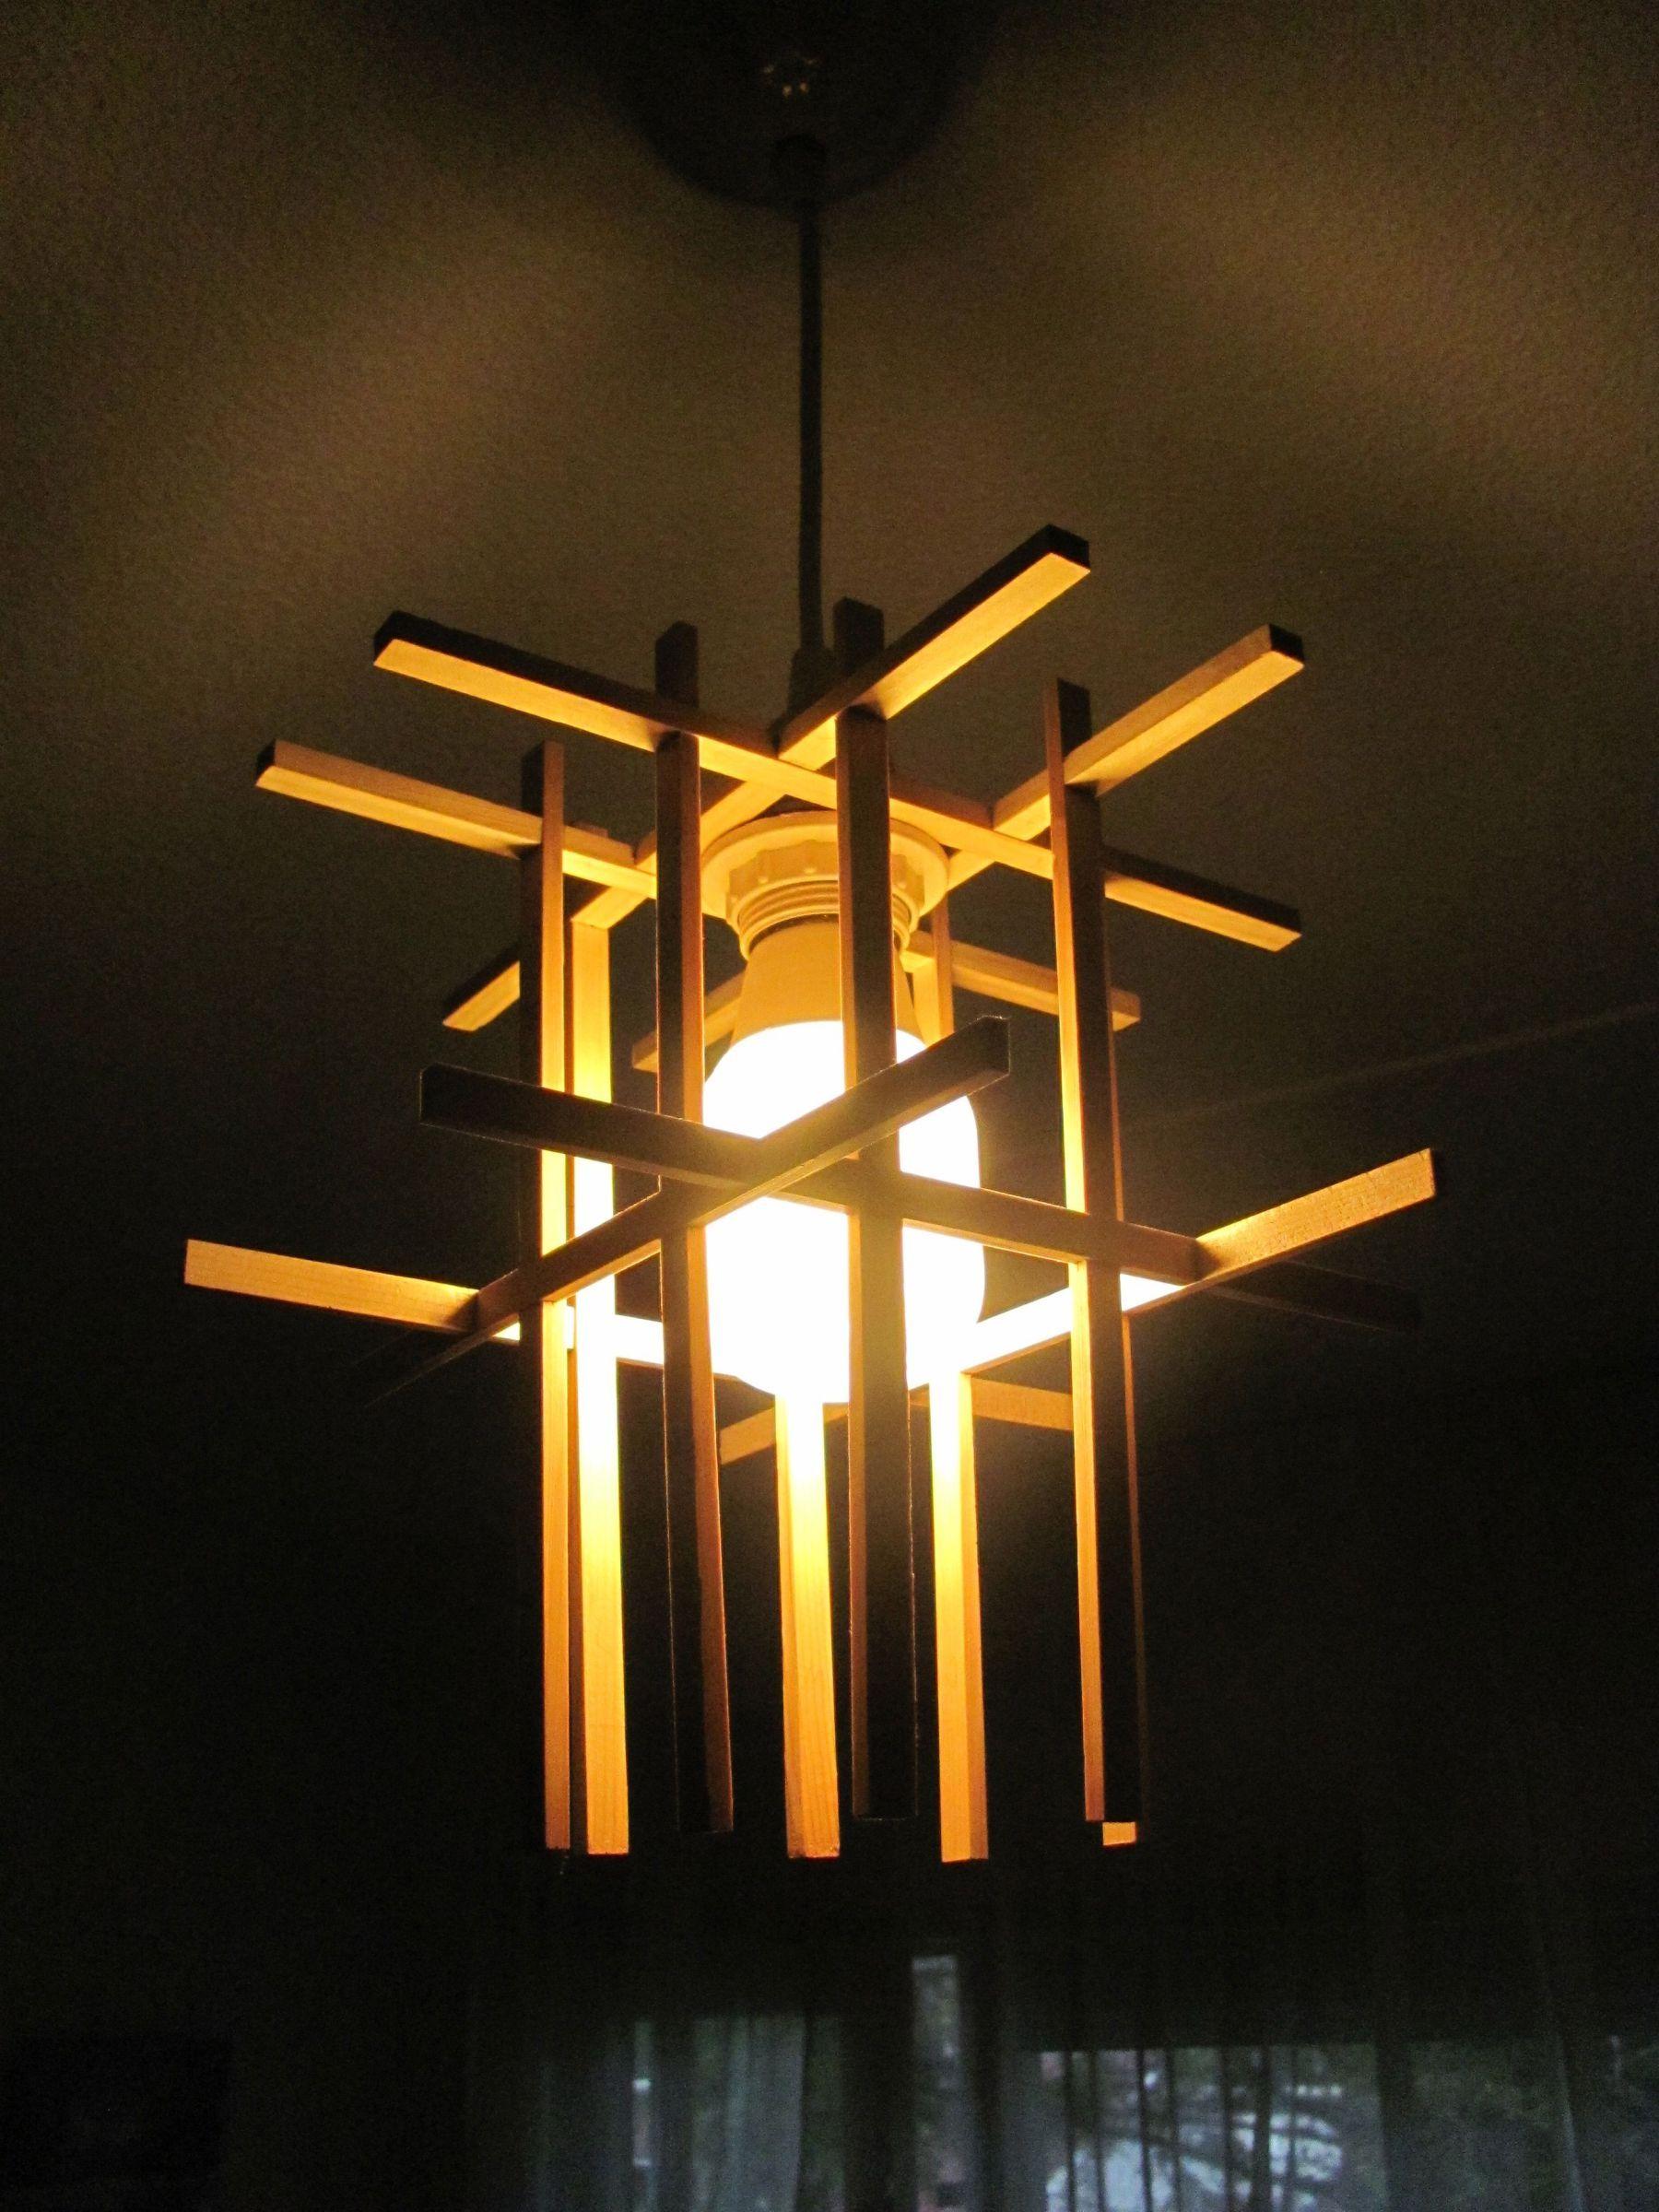 Wooden Lampshade Hanging Lamp Design Diy Lamp Shade Wooden Lampshade